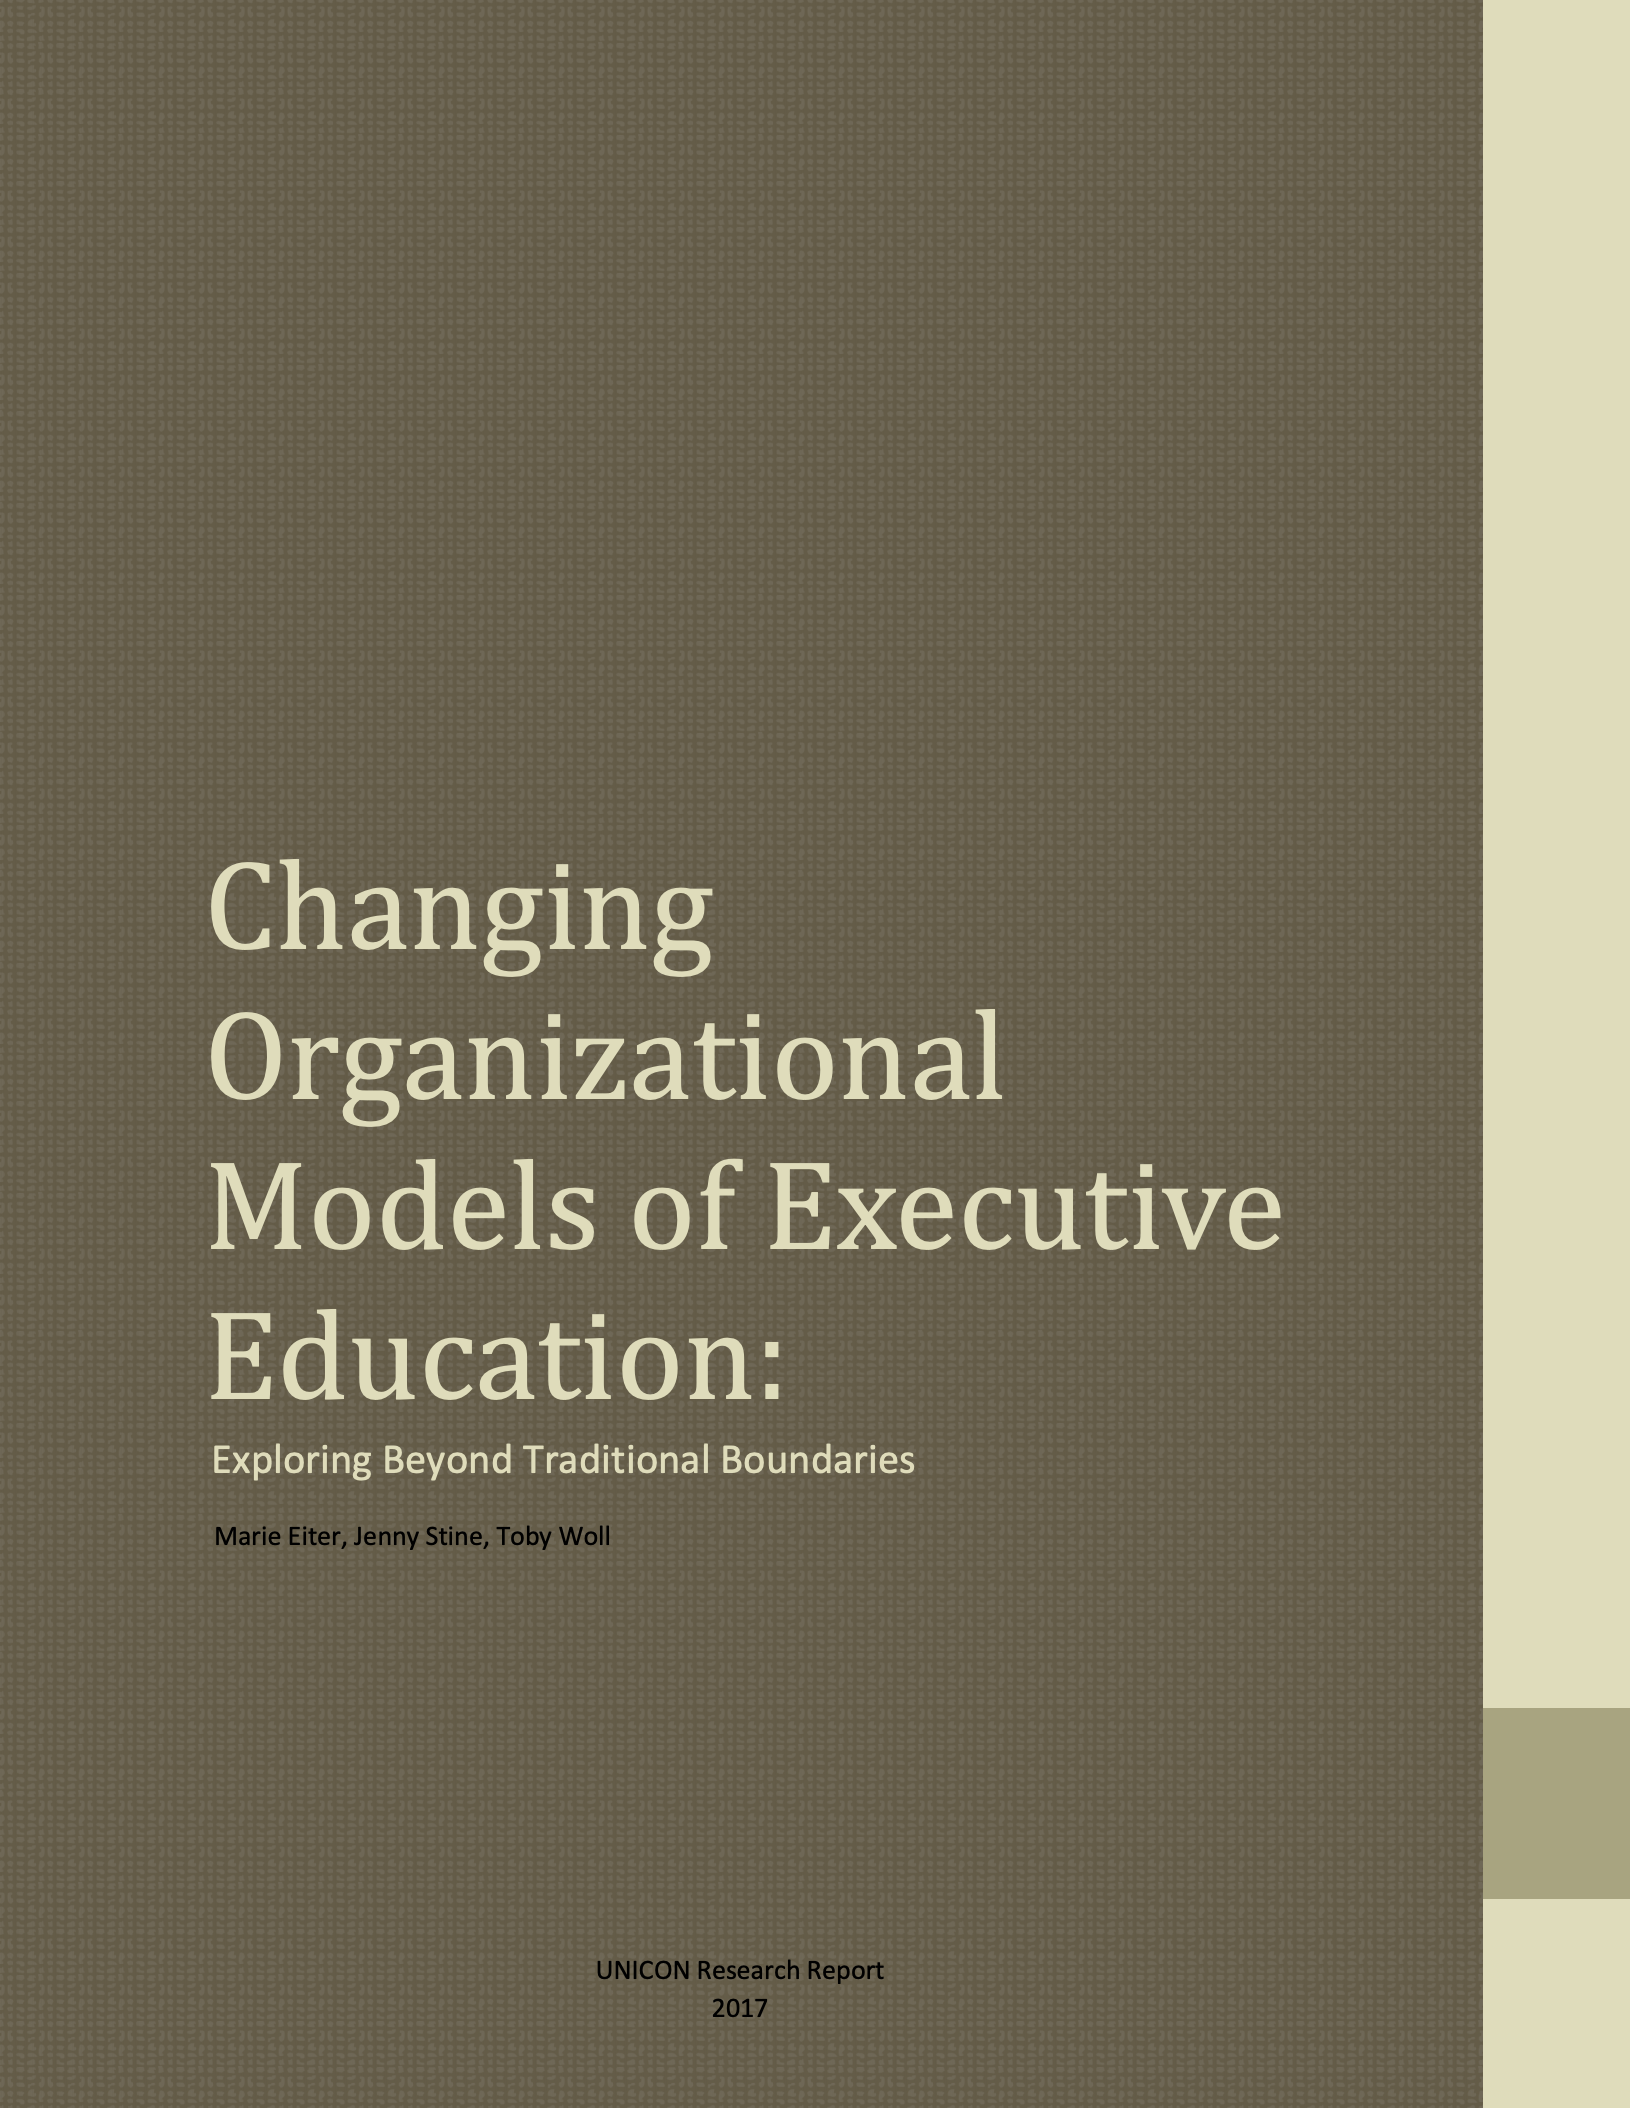 Changing Organizational Models of Executive Education: Exploring Beyond Traditional Boundaries . May, 2017